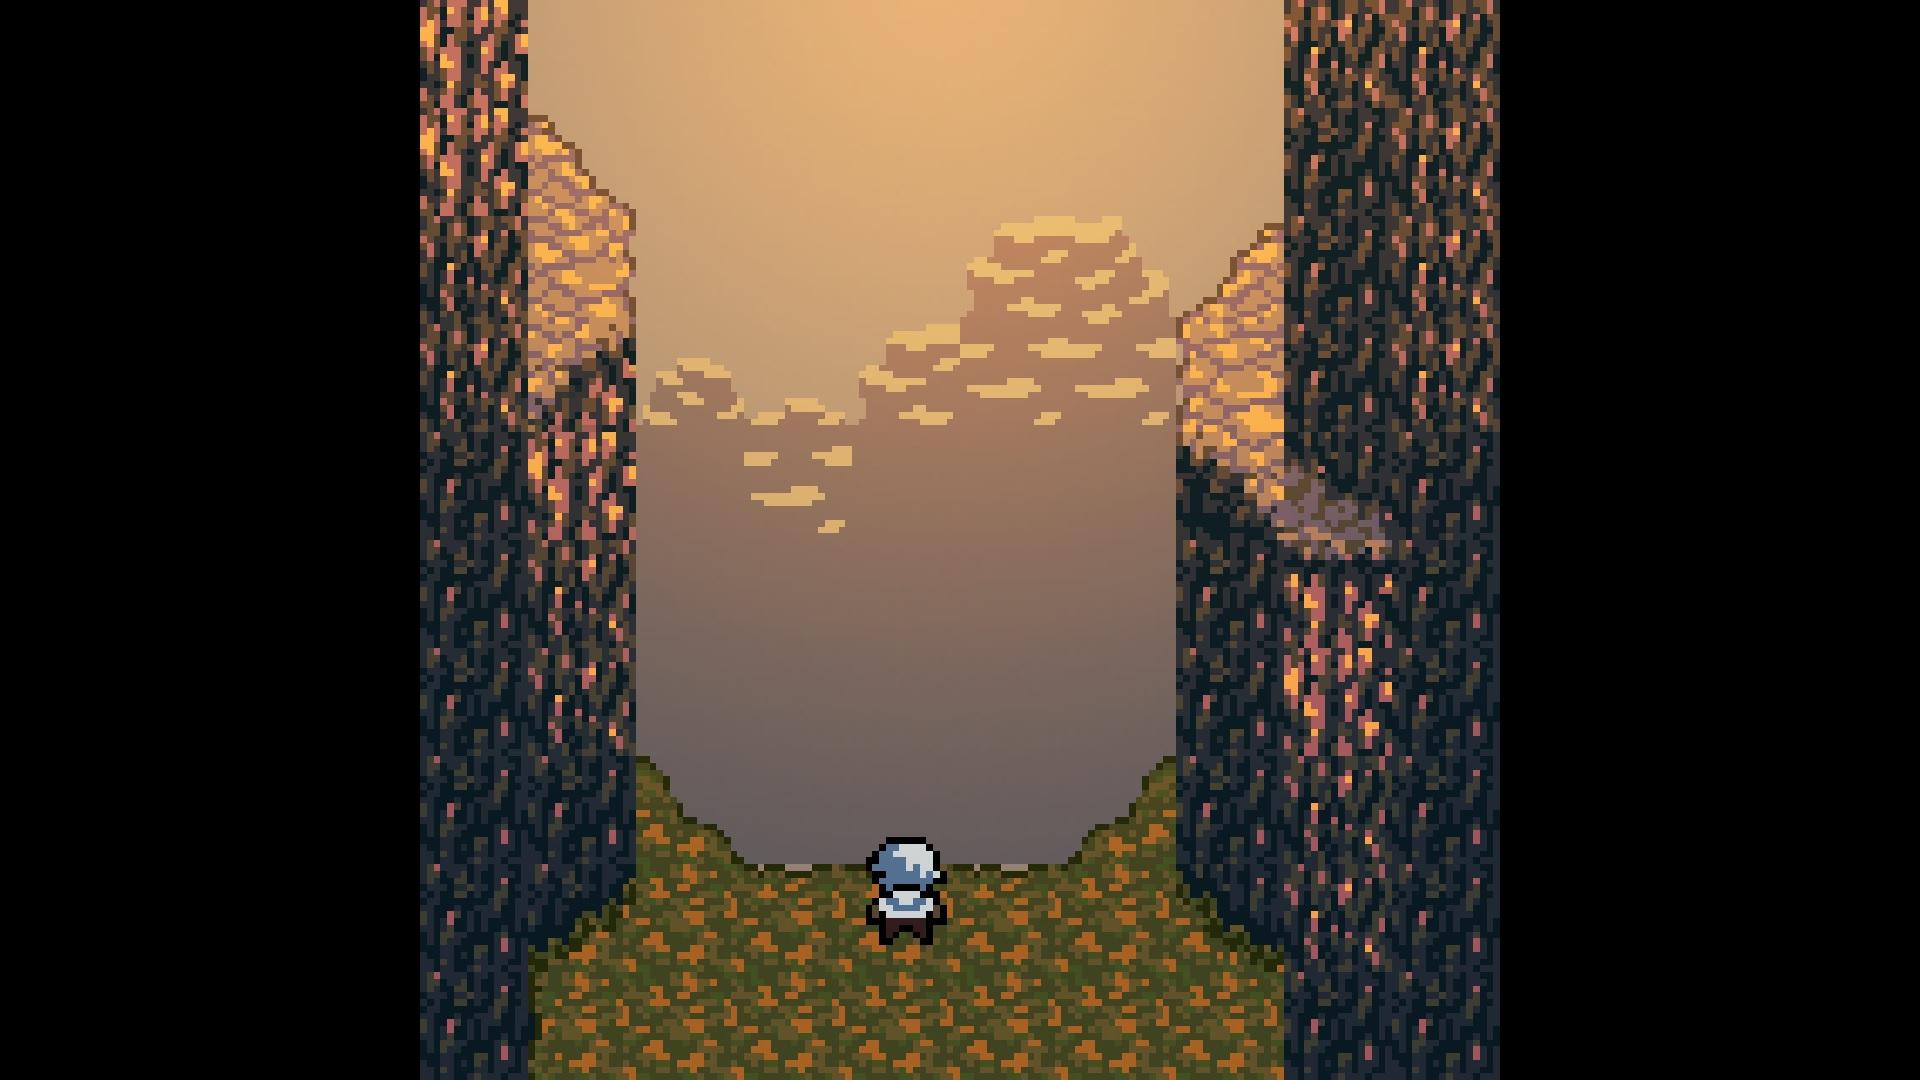 Zelda-inspired Anodyne is heading to PS4 and Xbox One next week screenshot